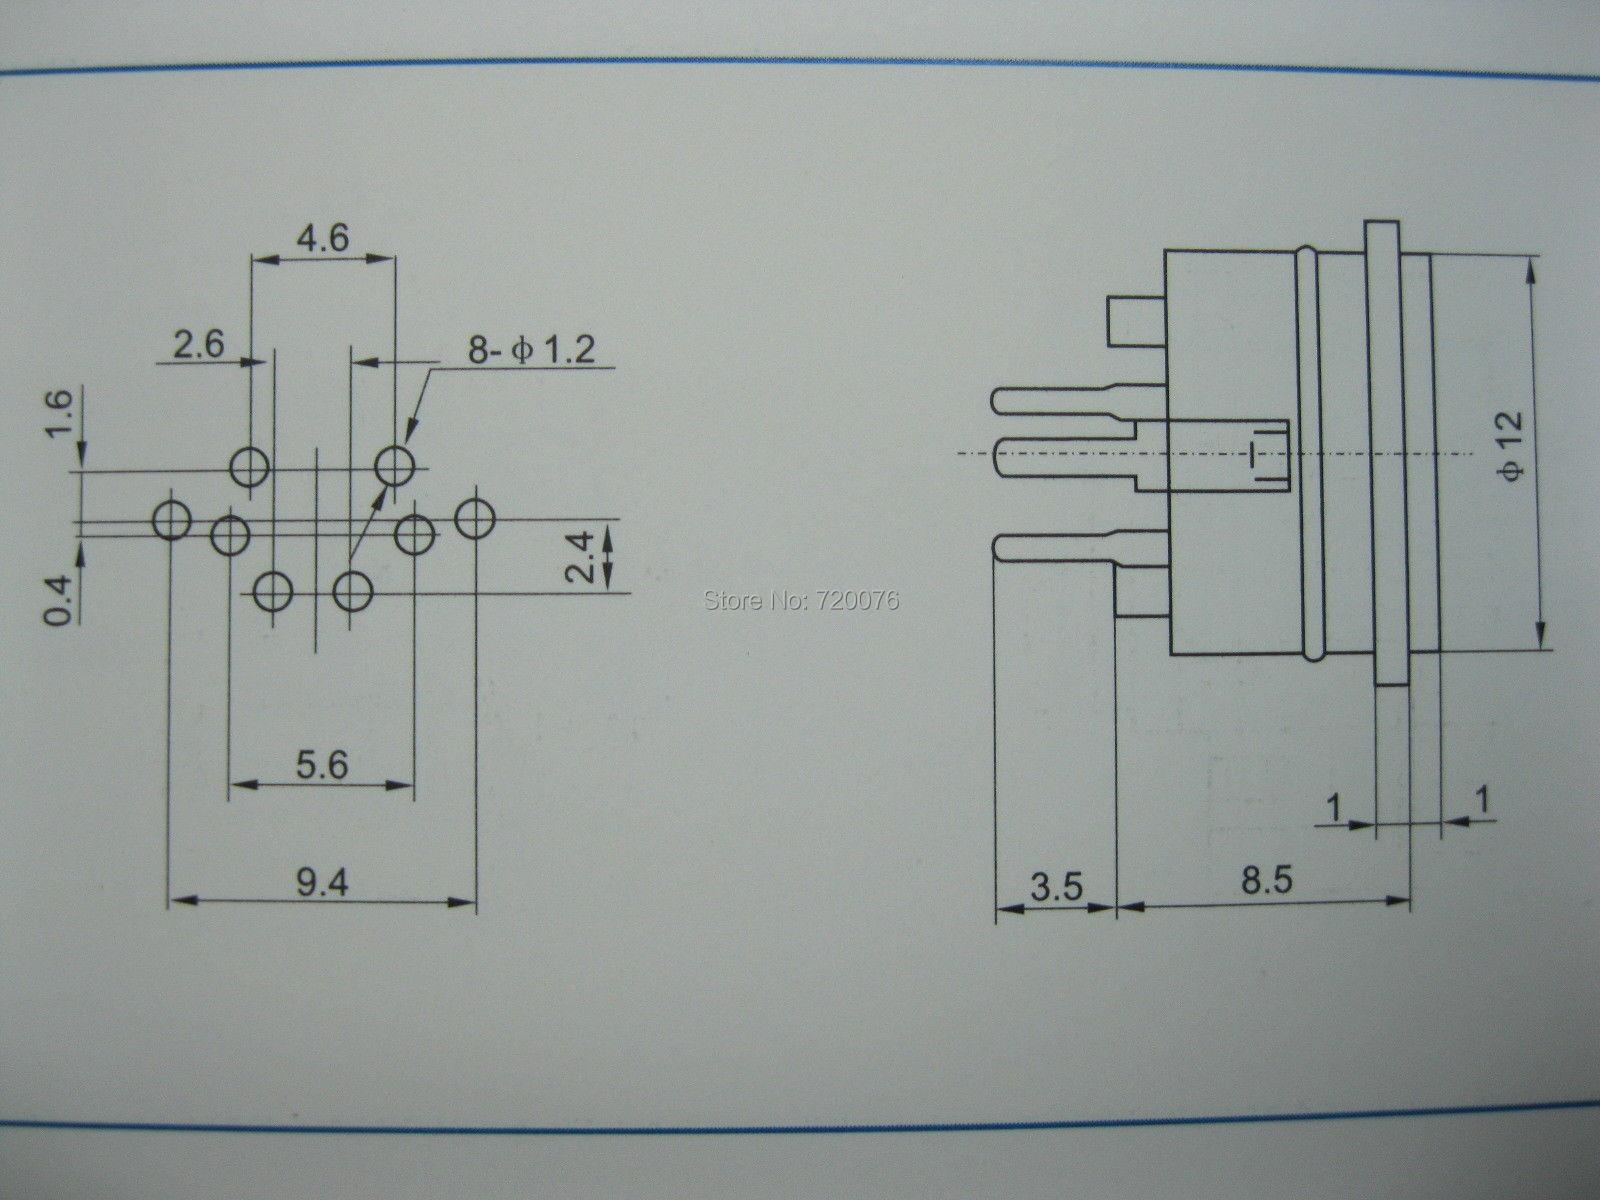 6 Pin Mini Din Plug Wiring Diagram - Wiring Diagrams Schematics